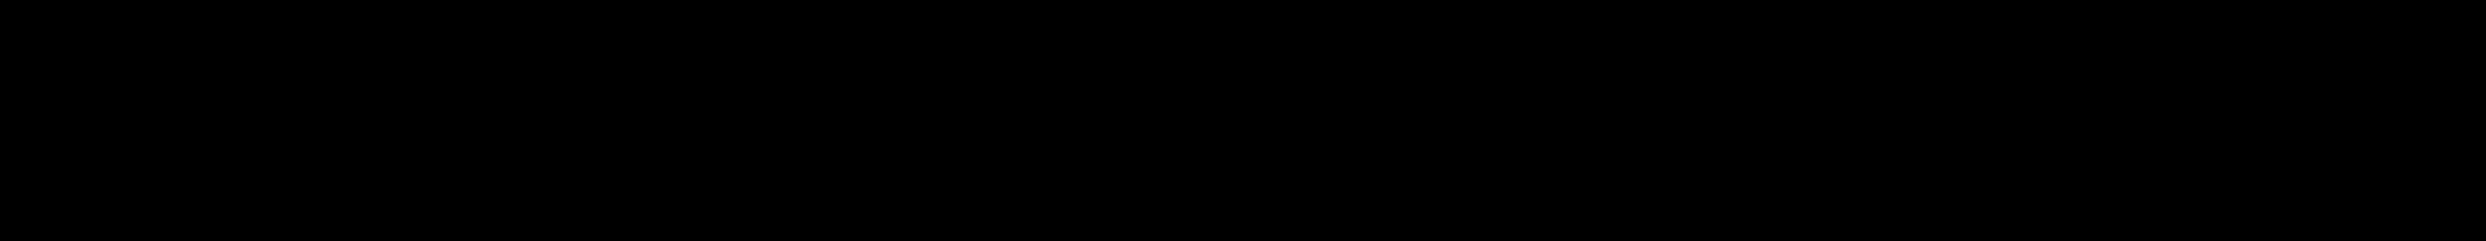 Museo Sans Condensed 500 Italic